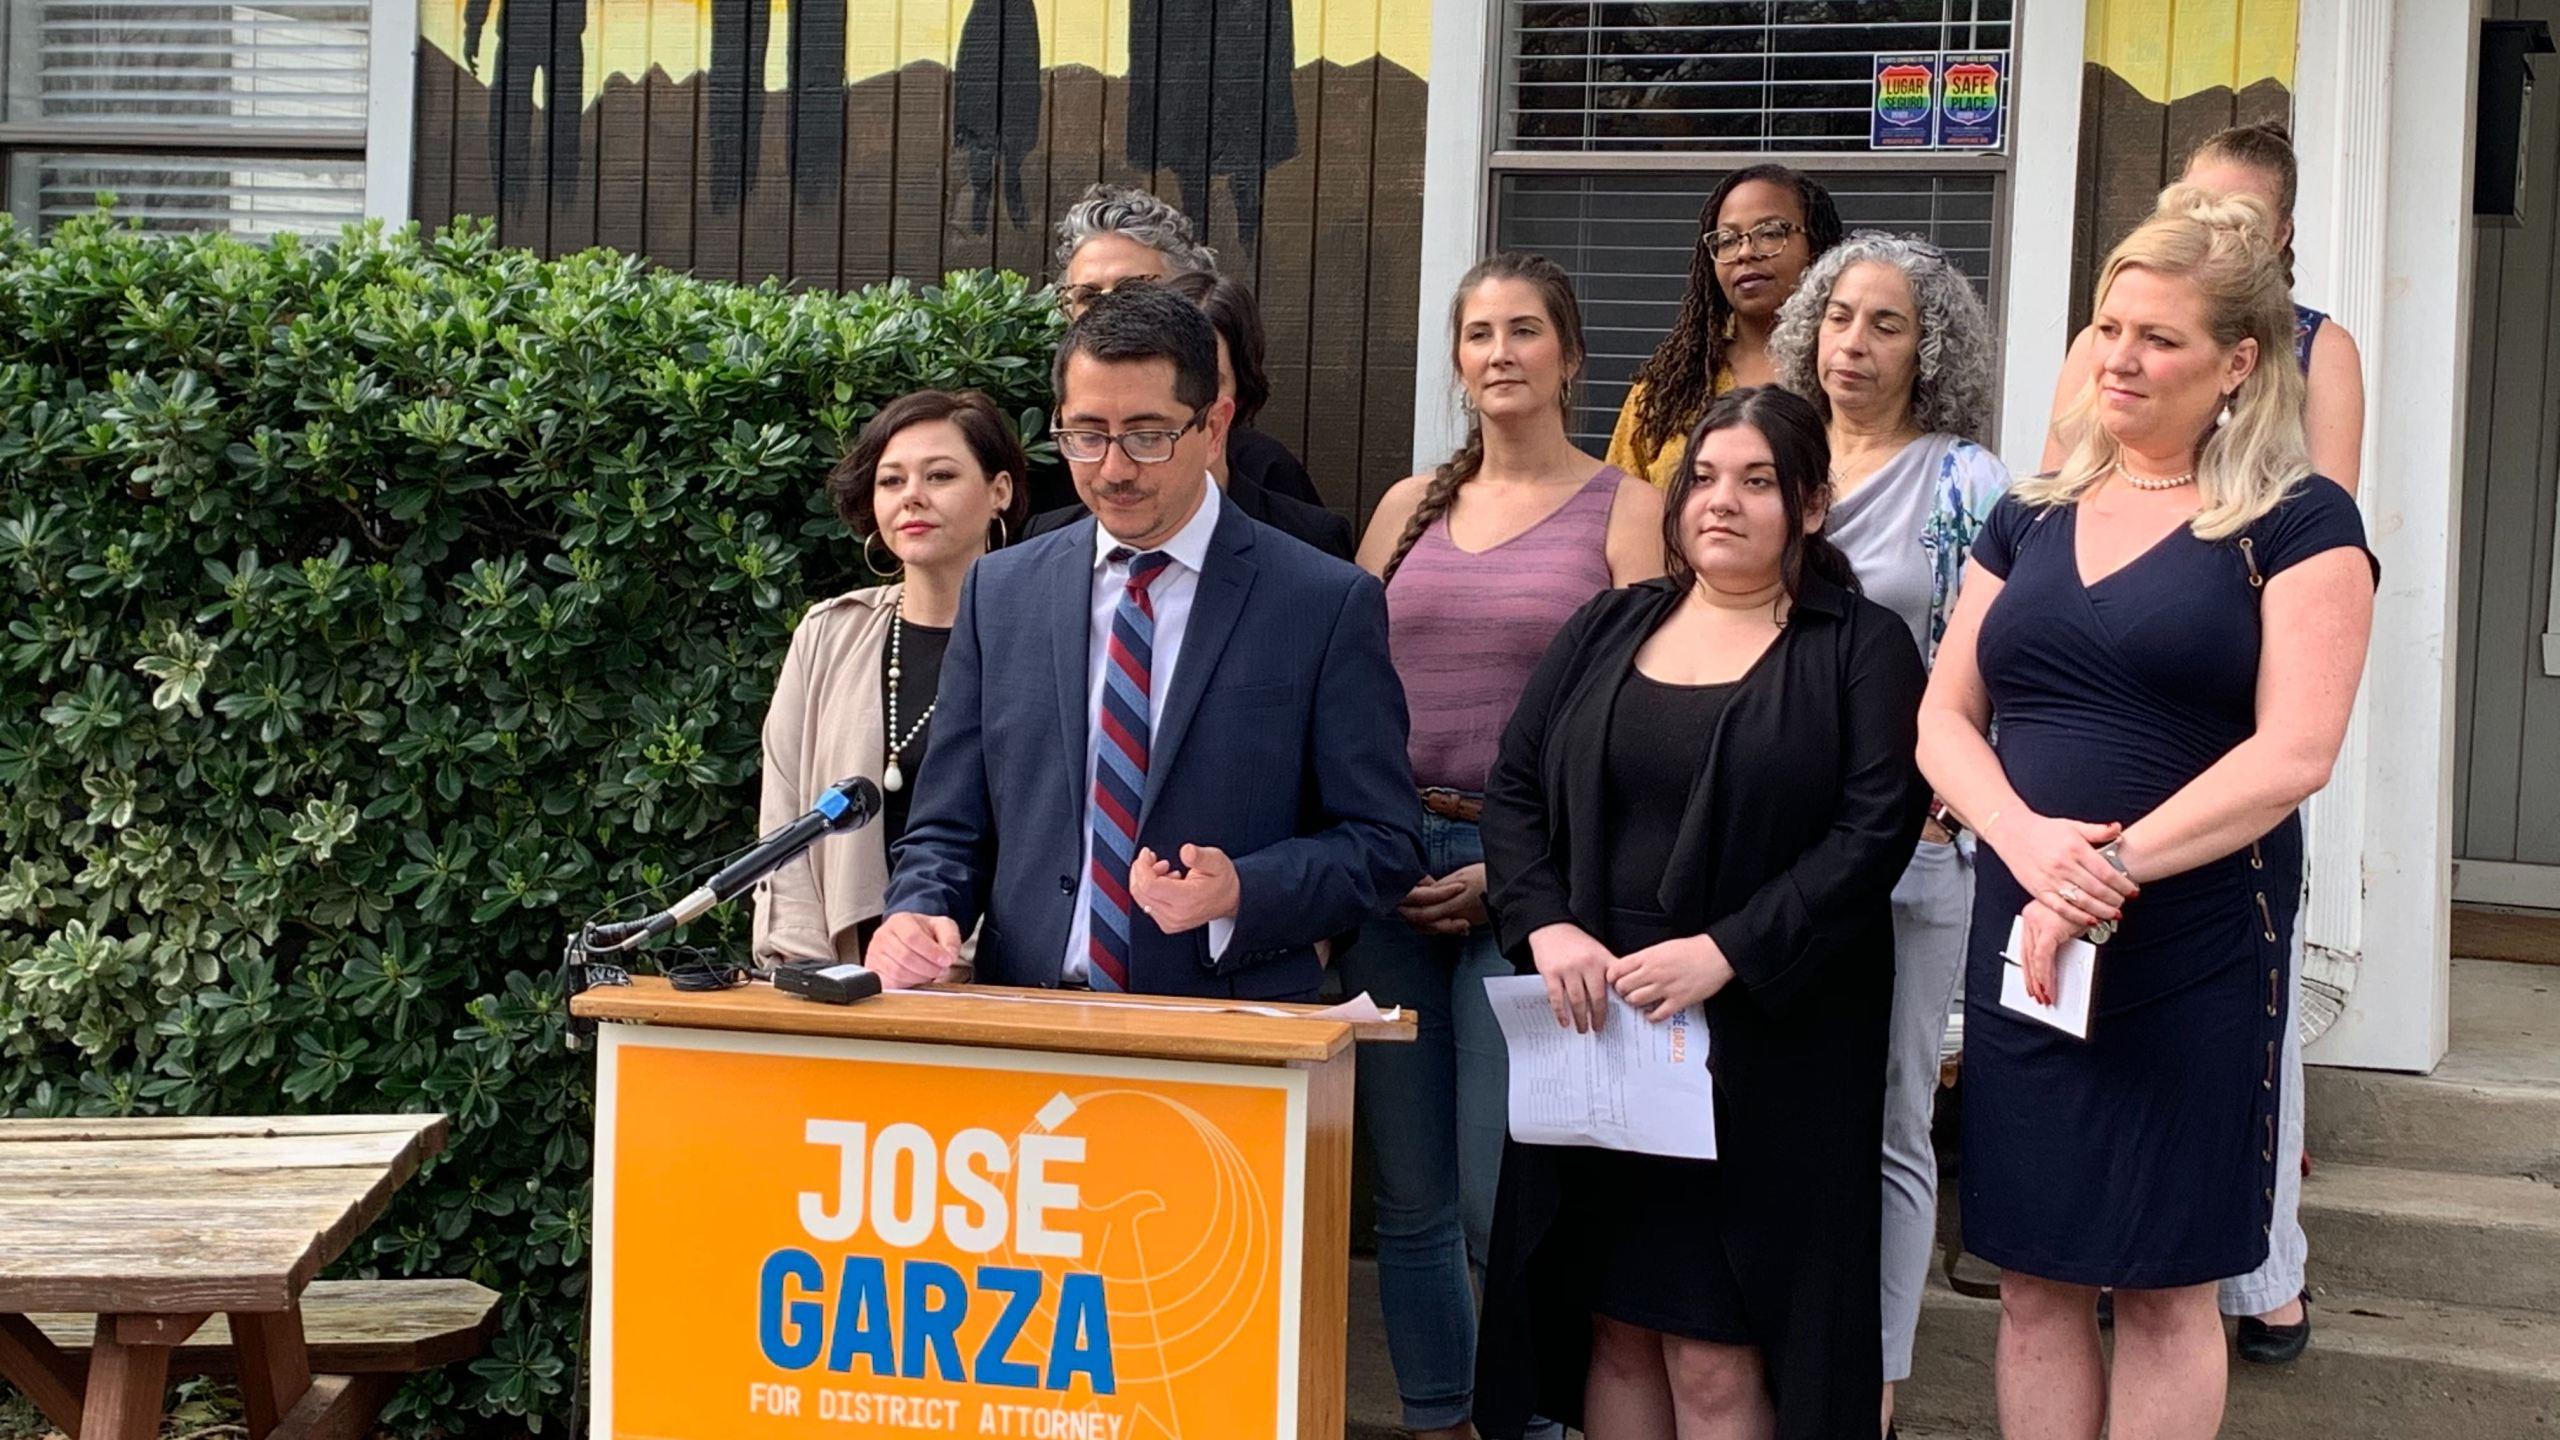 Jose Garza support